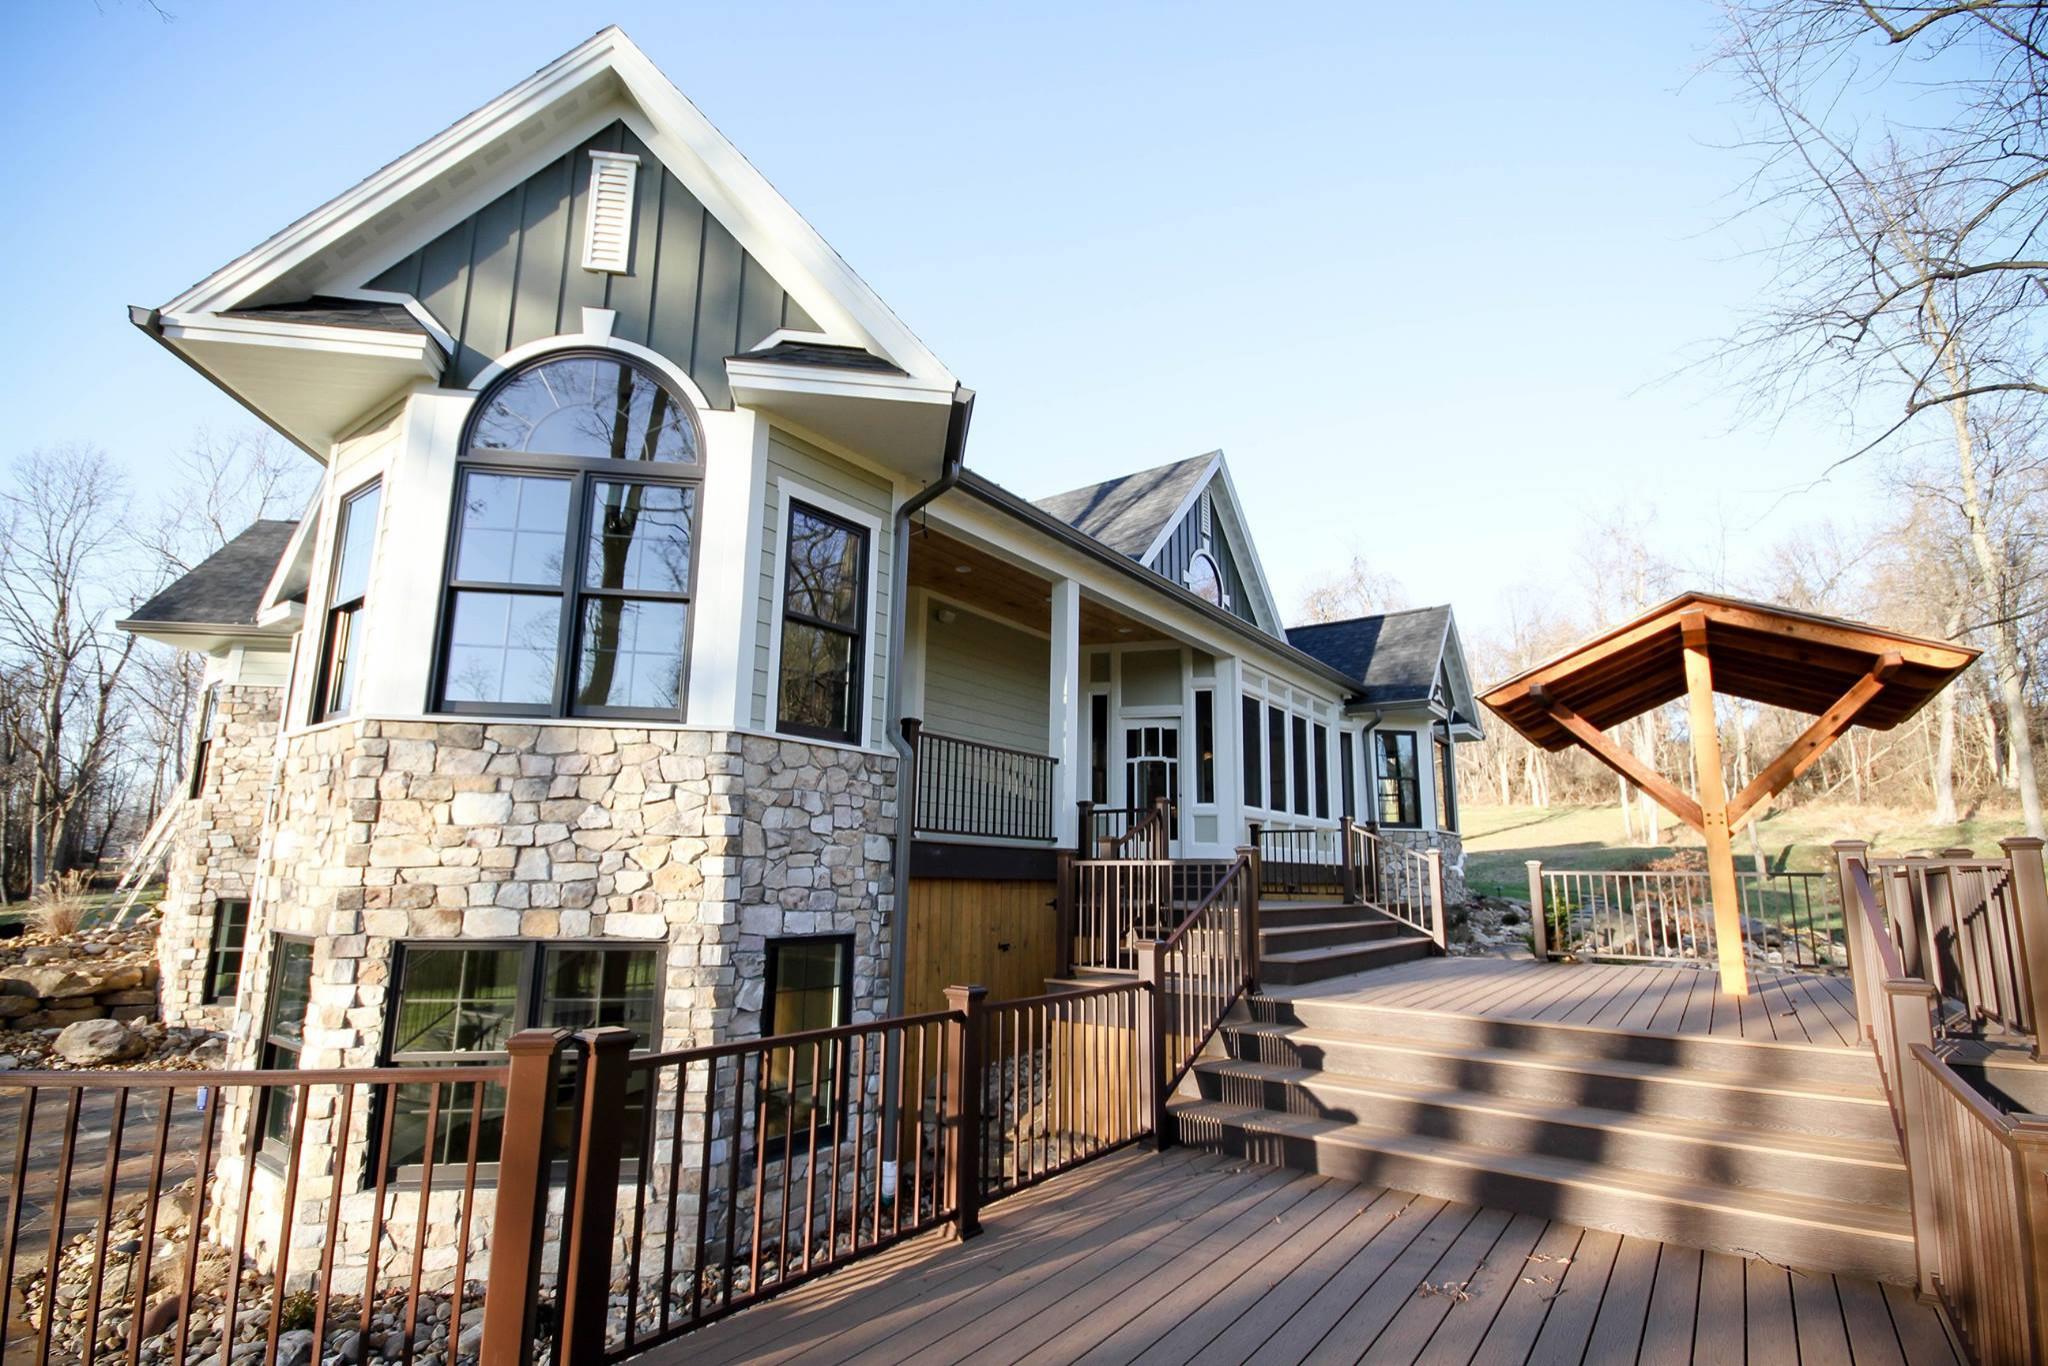 Custom Home: New Construction and Deck/Pergola